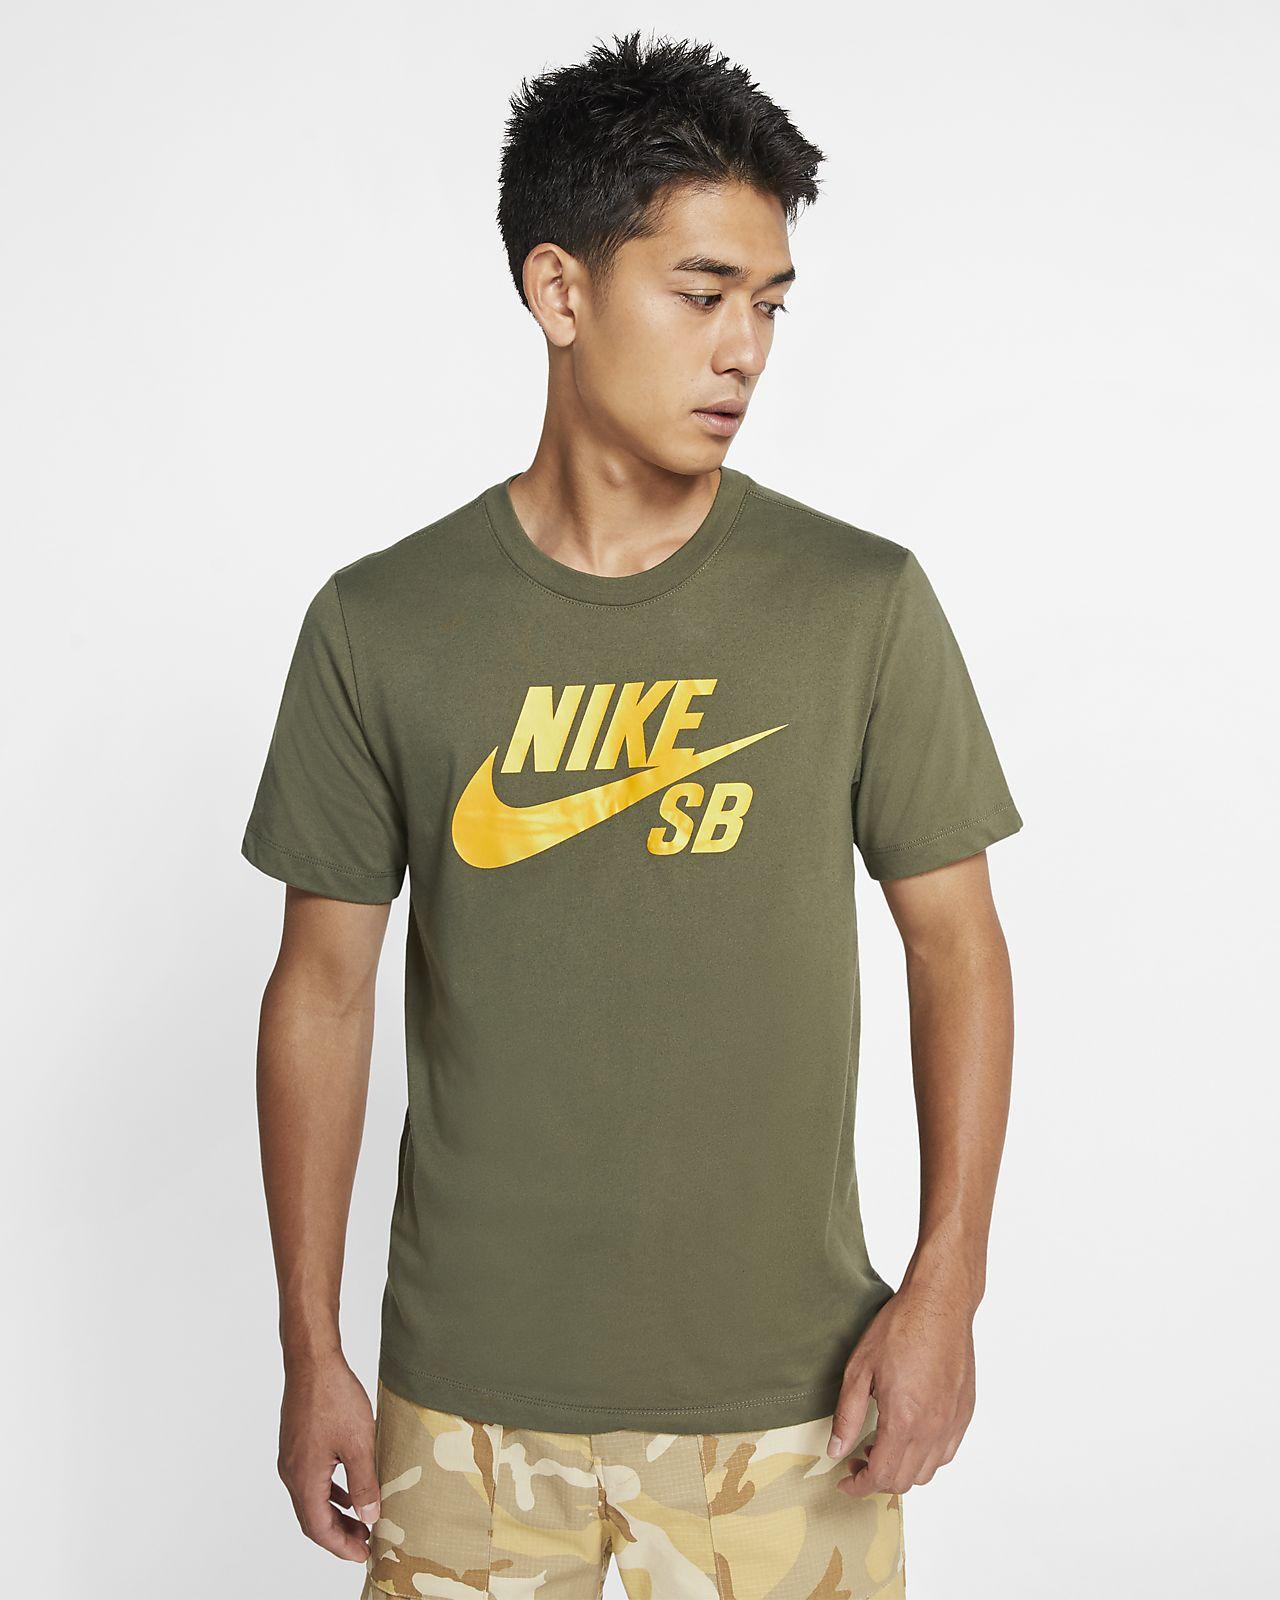 Tee-shirt de skateboard Nike SB Dri-FIT